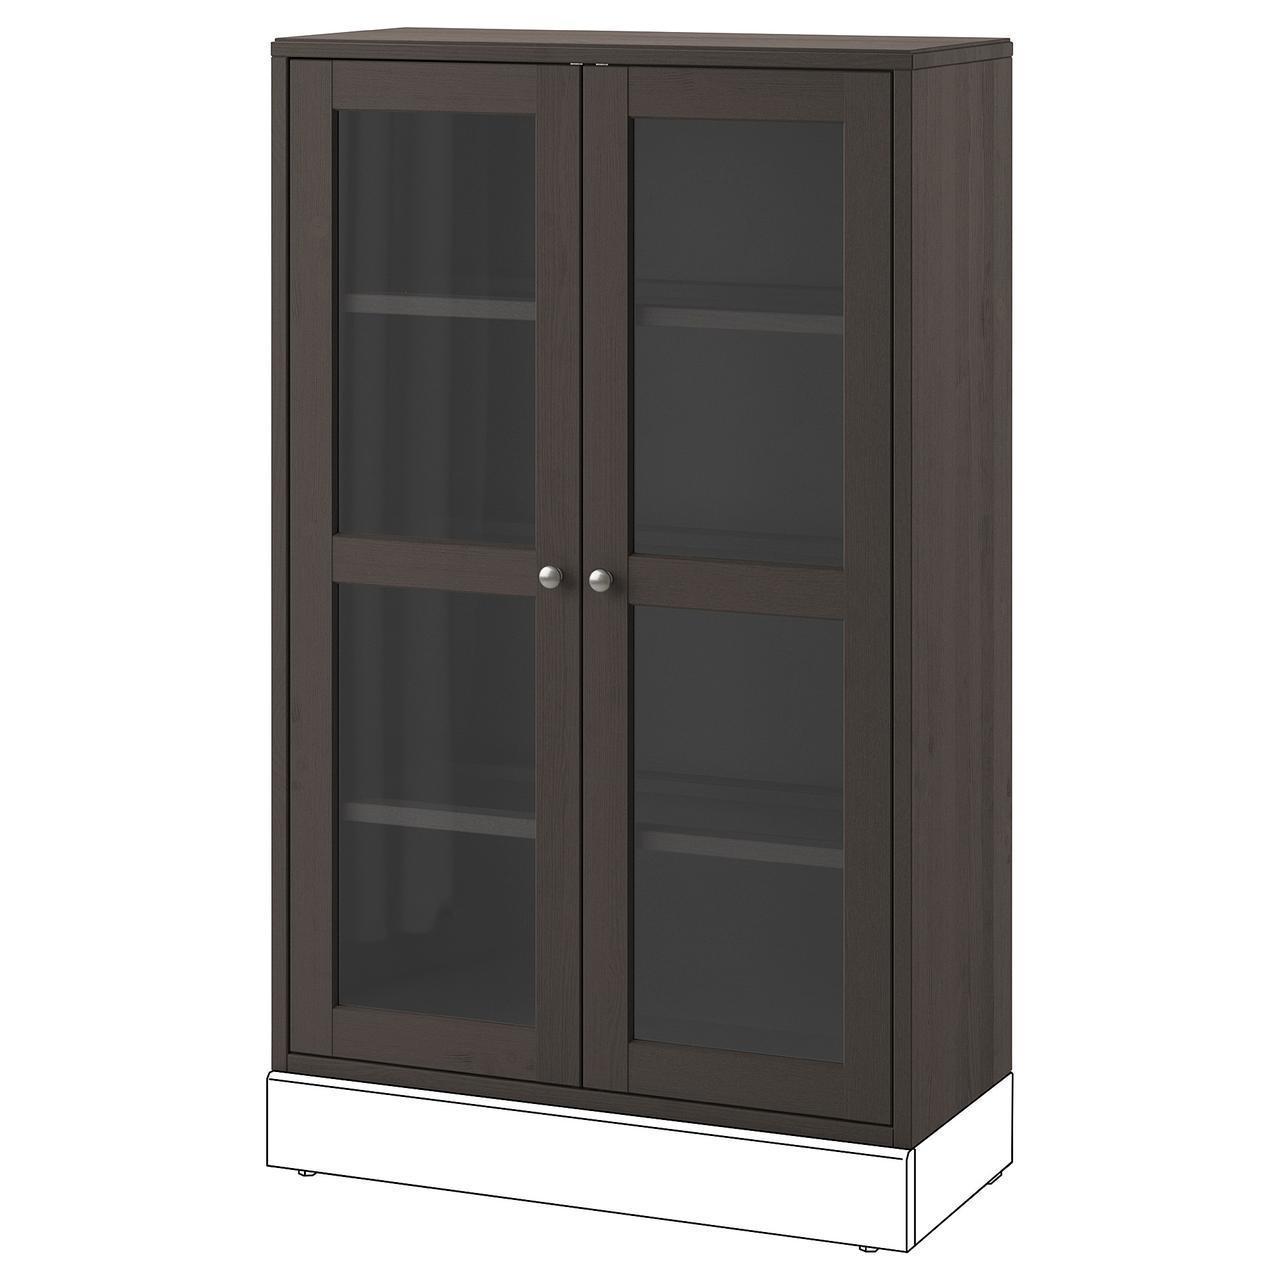 Сервант IKEA HAVSTA 81x123x35 см темно-коричневый 303.910.59